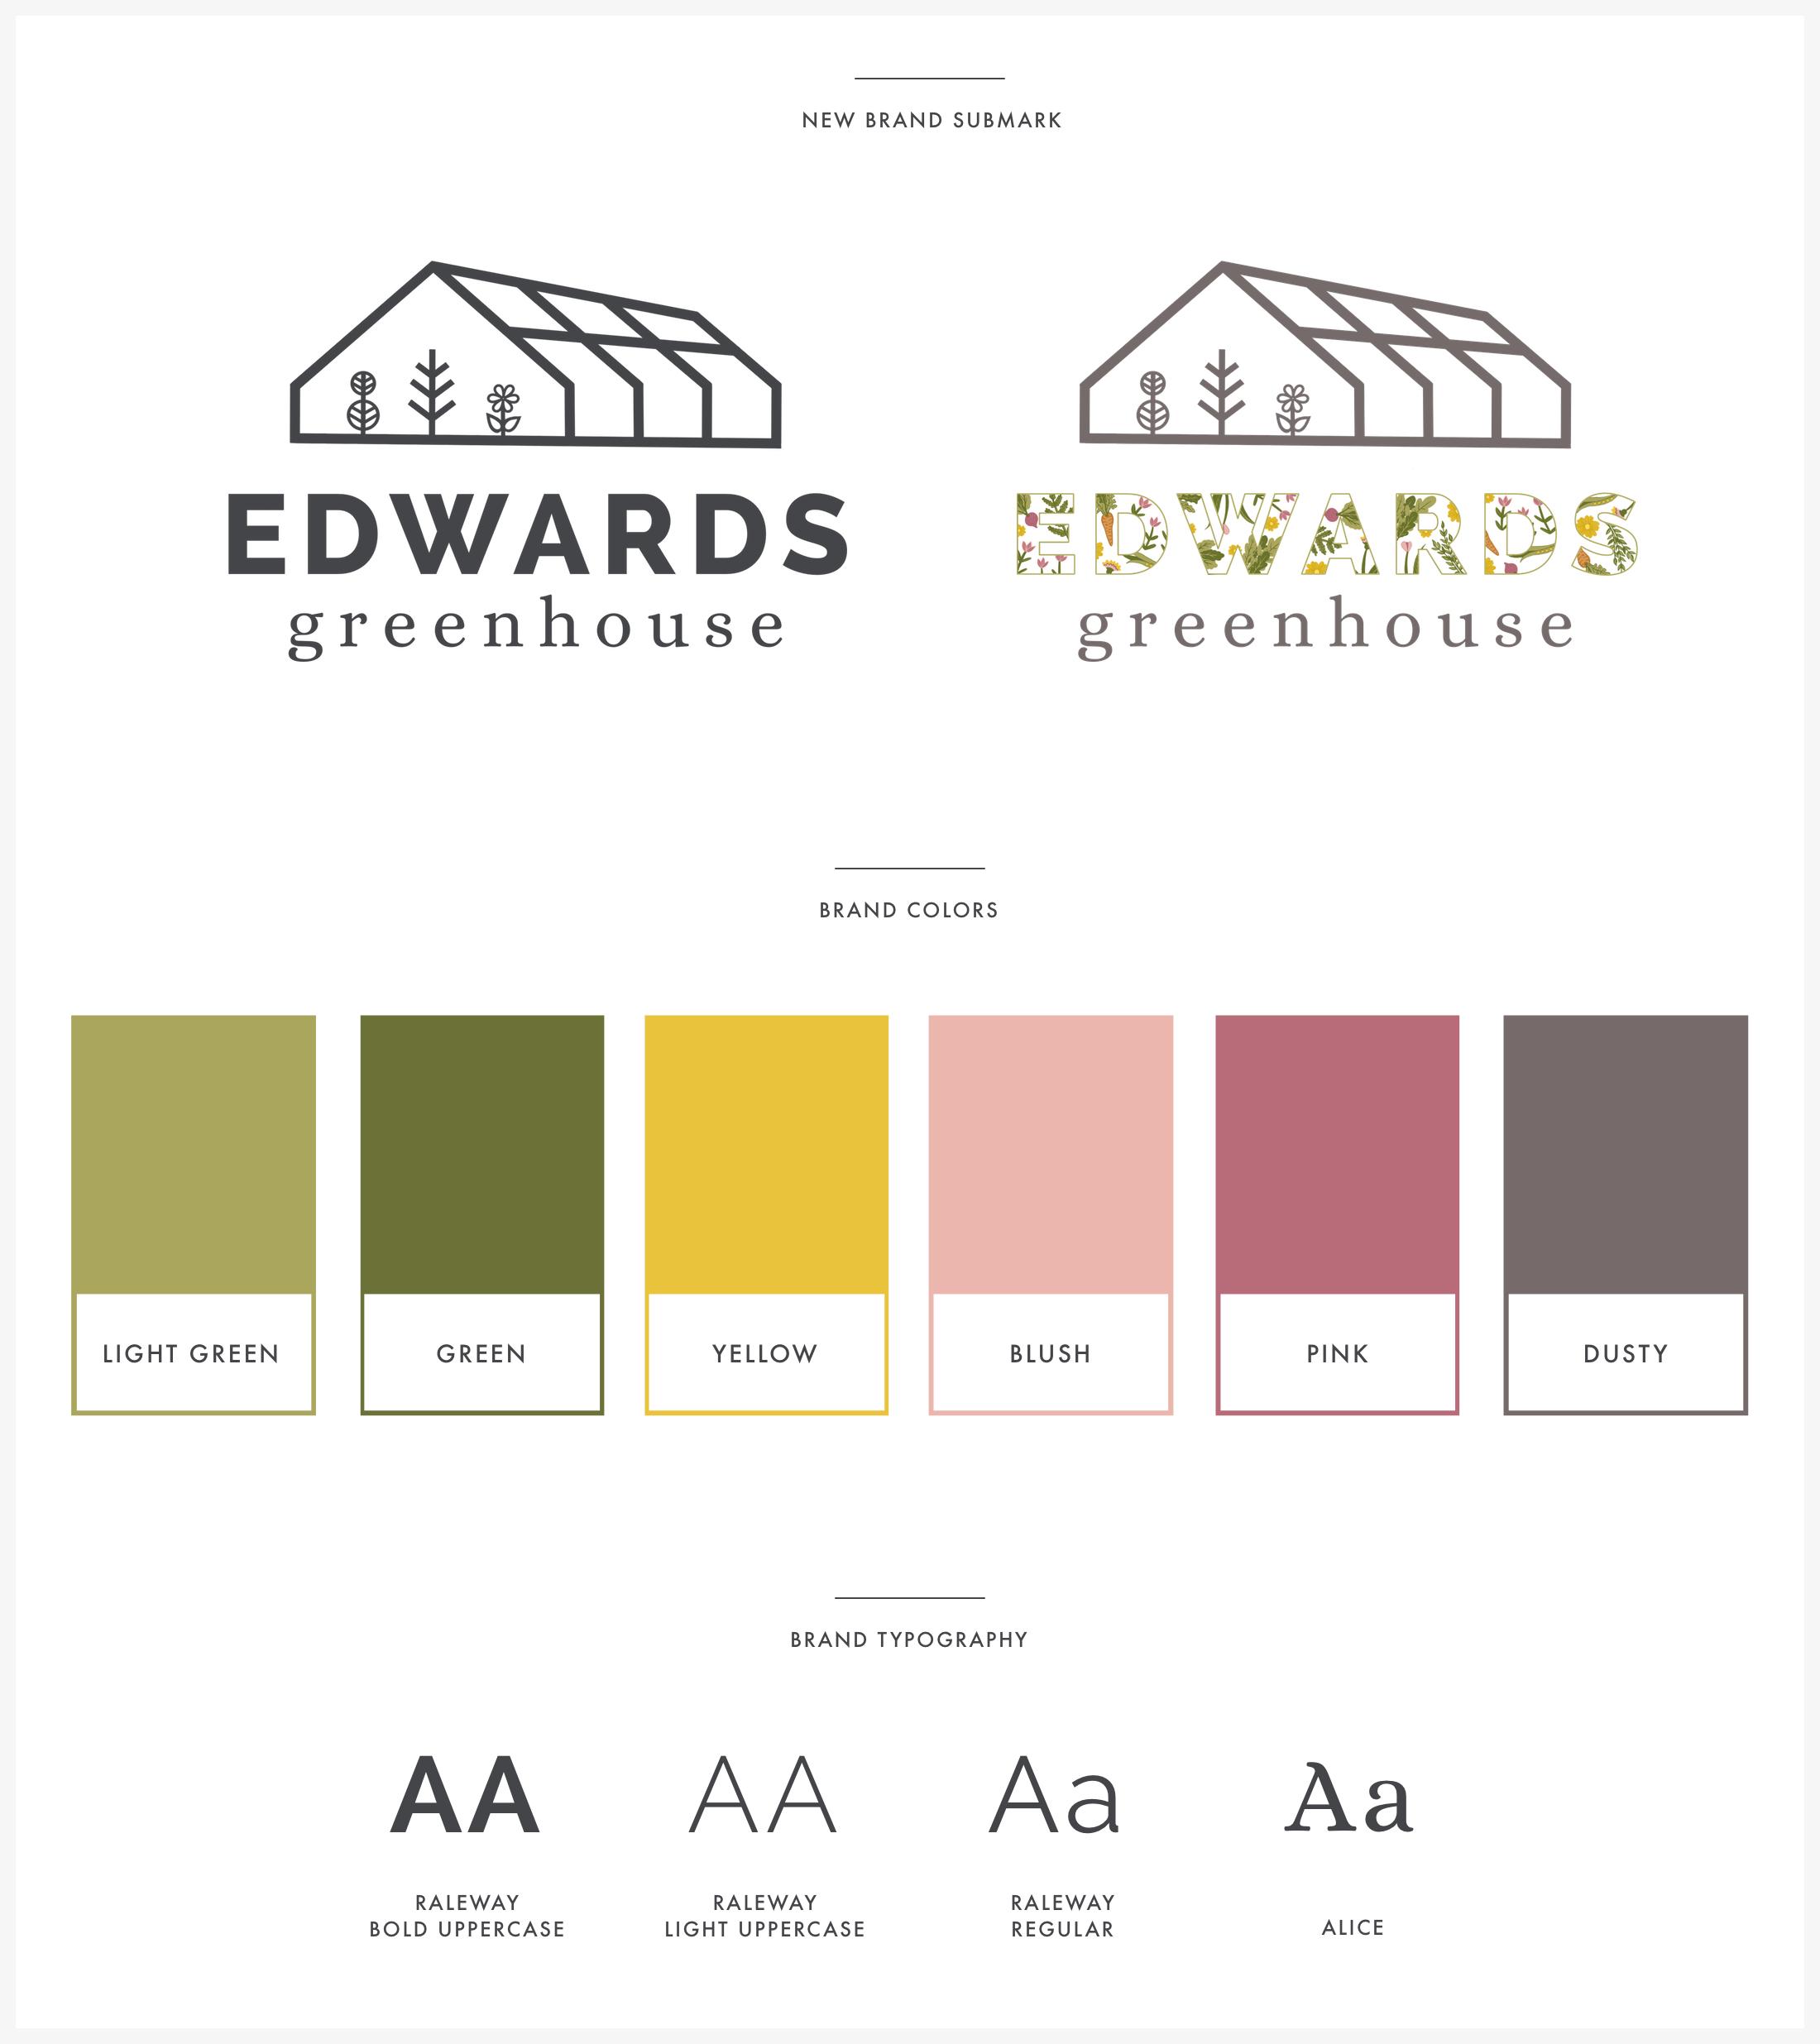 edwards-greenhouse-ekd.jpg